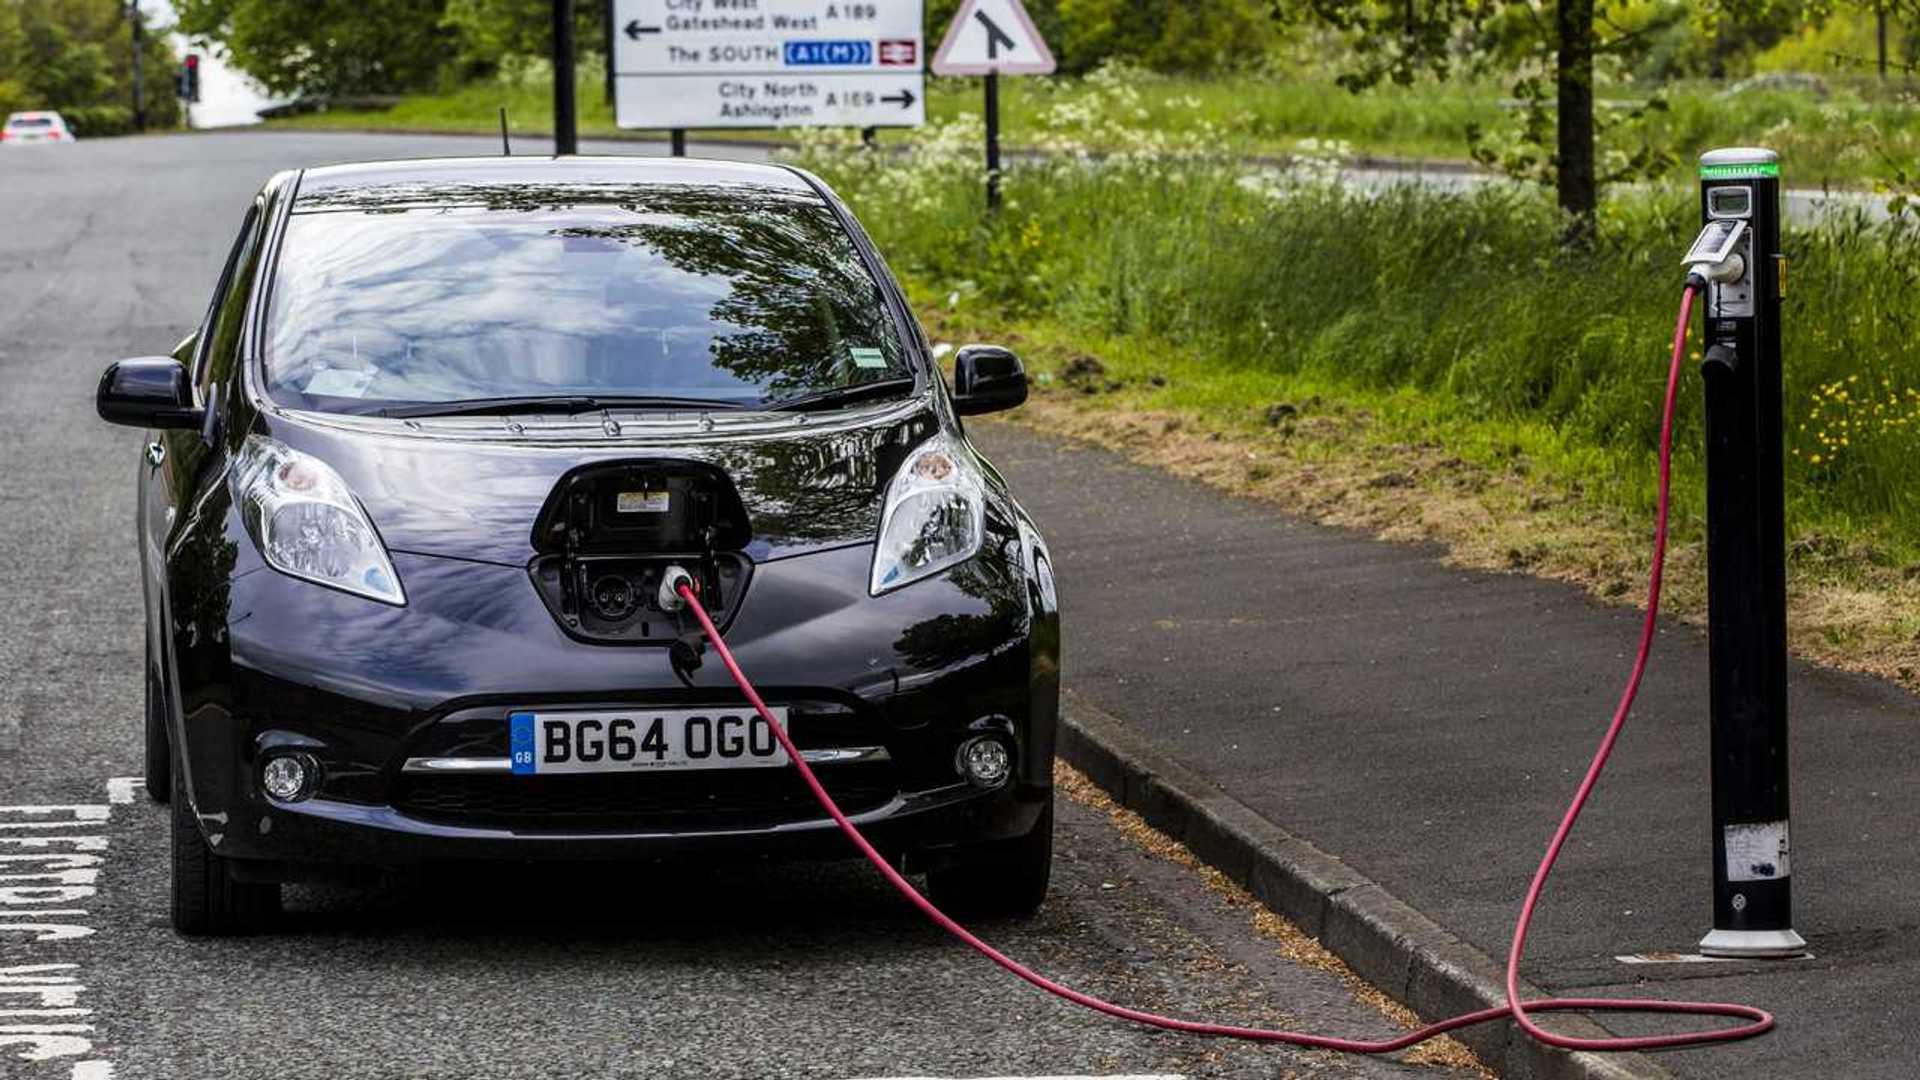 Elektrik Nissan Leaf Newcastle Upon Tyne İngiltere'de şarj